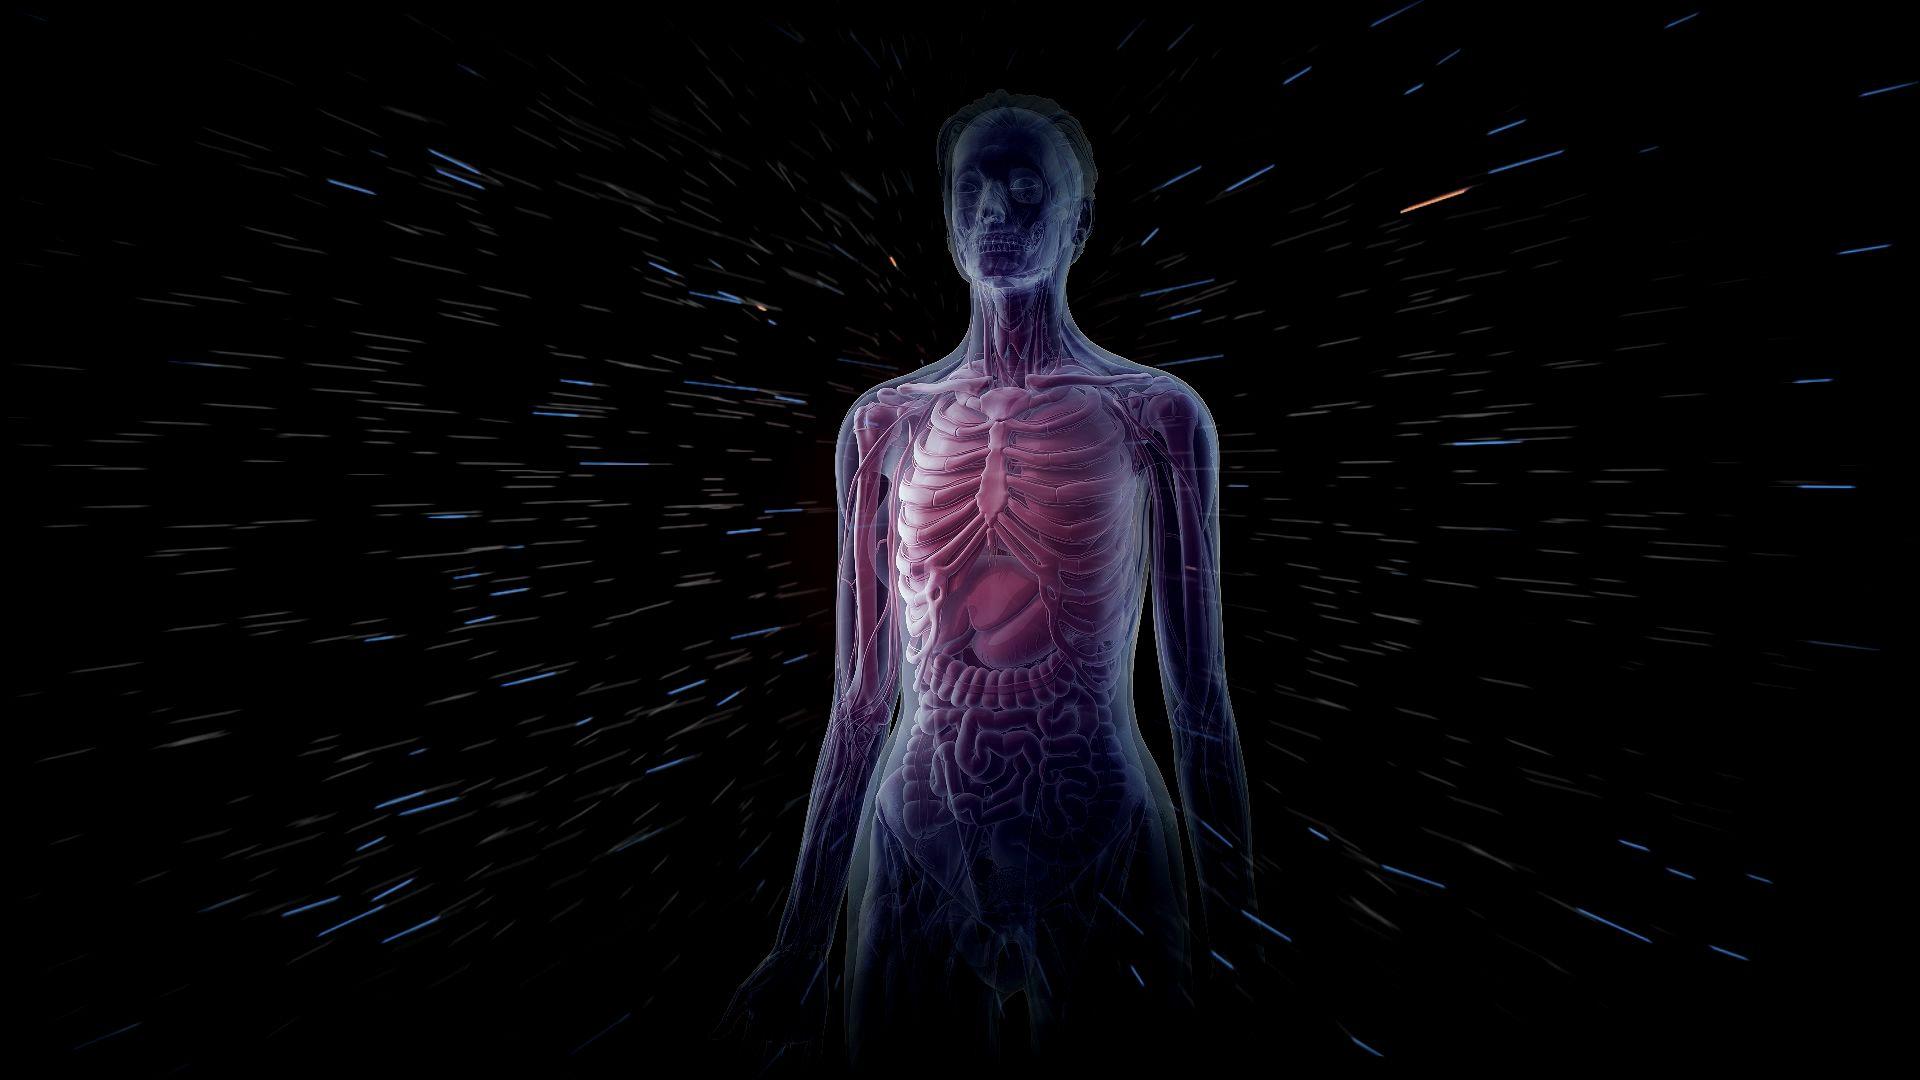 03_16_space_radiation_health